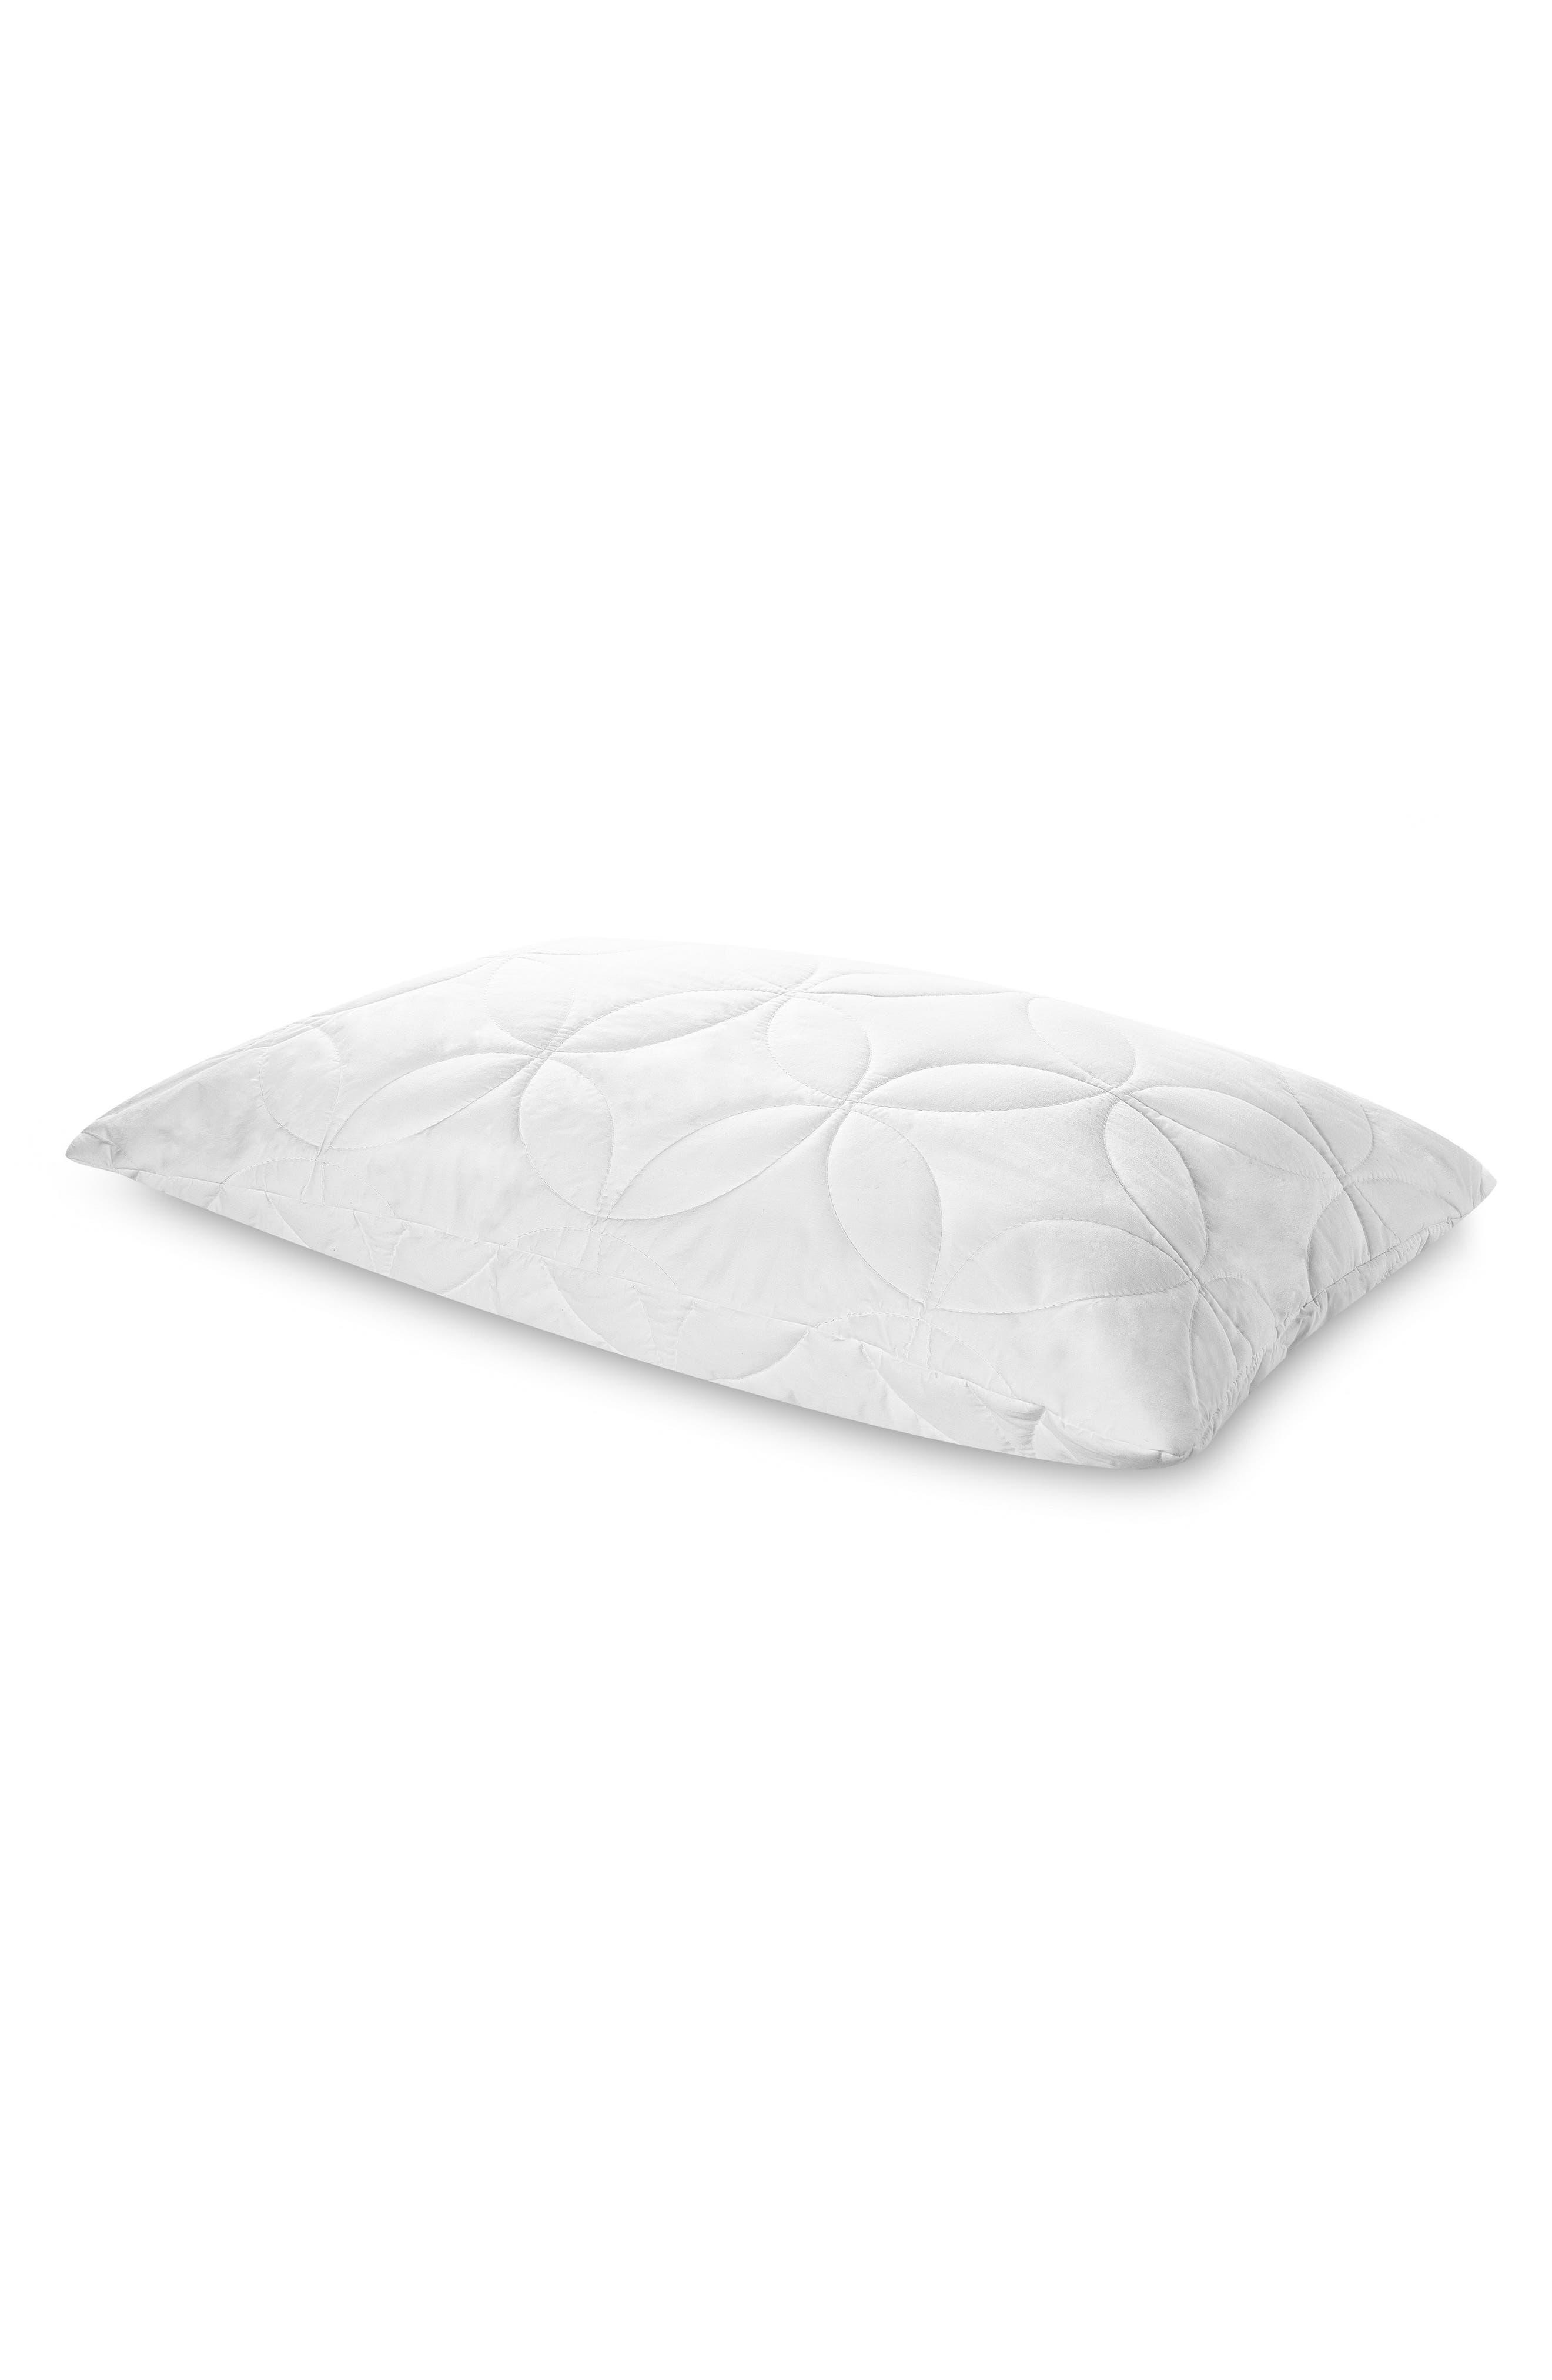 TEMPUR-Cloud Soft & Lofty Pillow,                         Main,                         color, WHITE